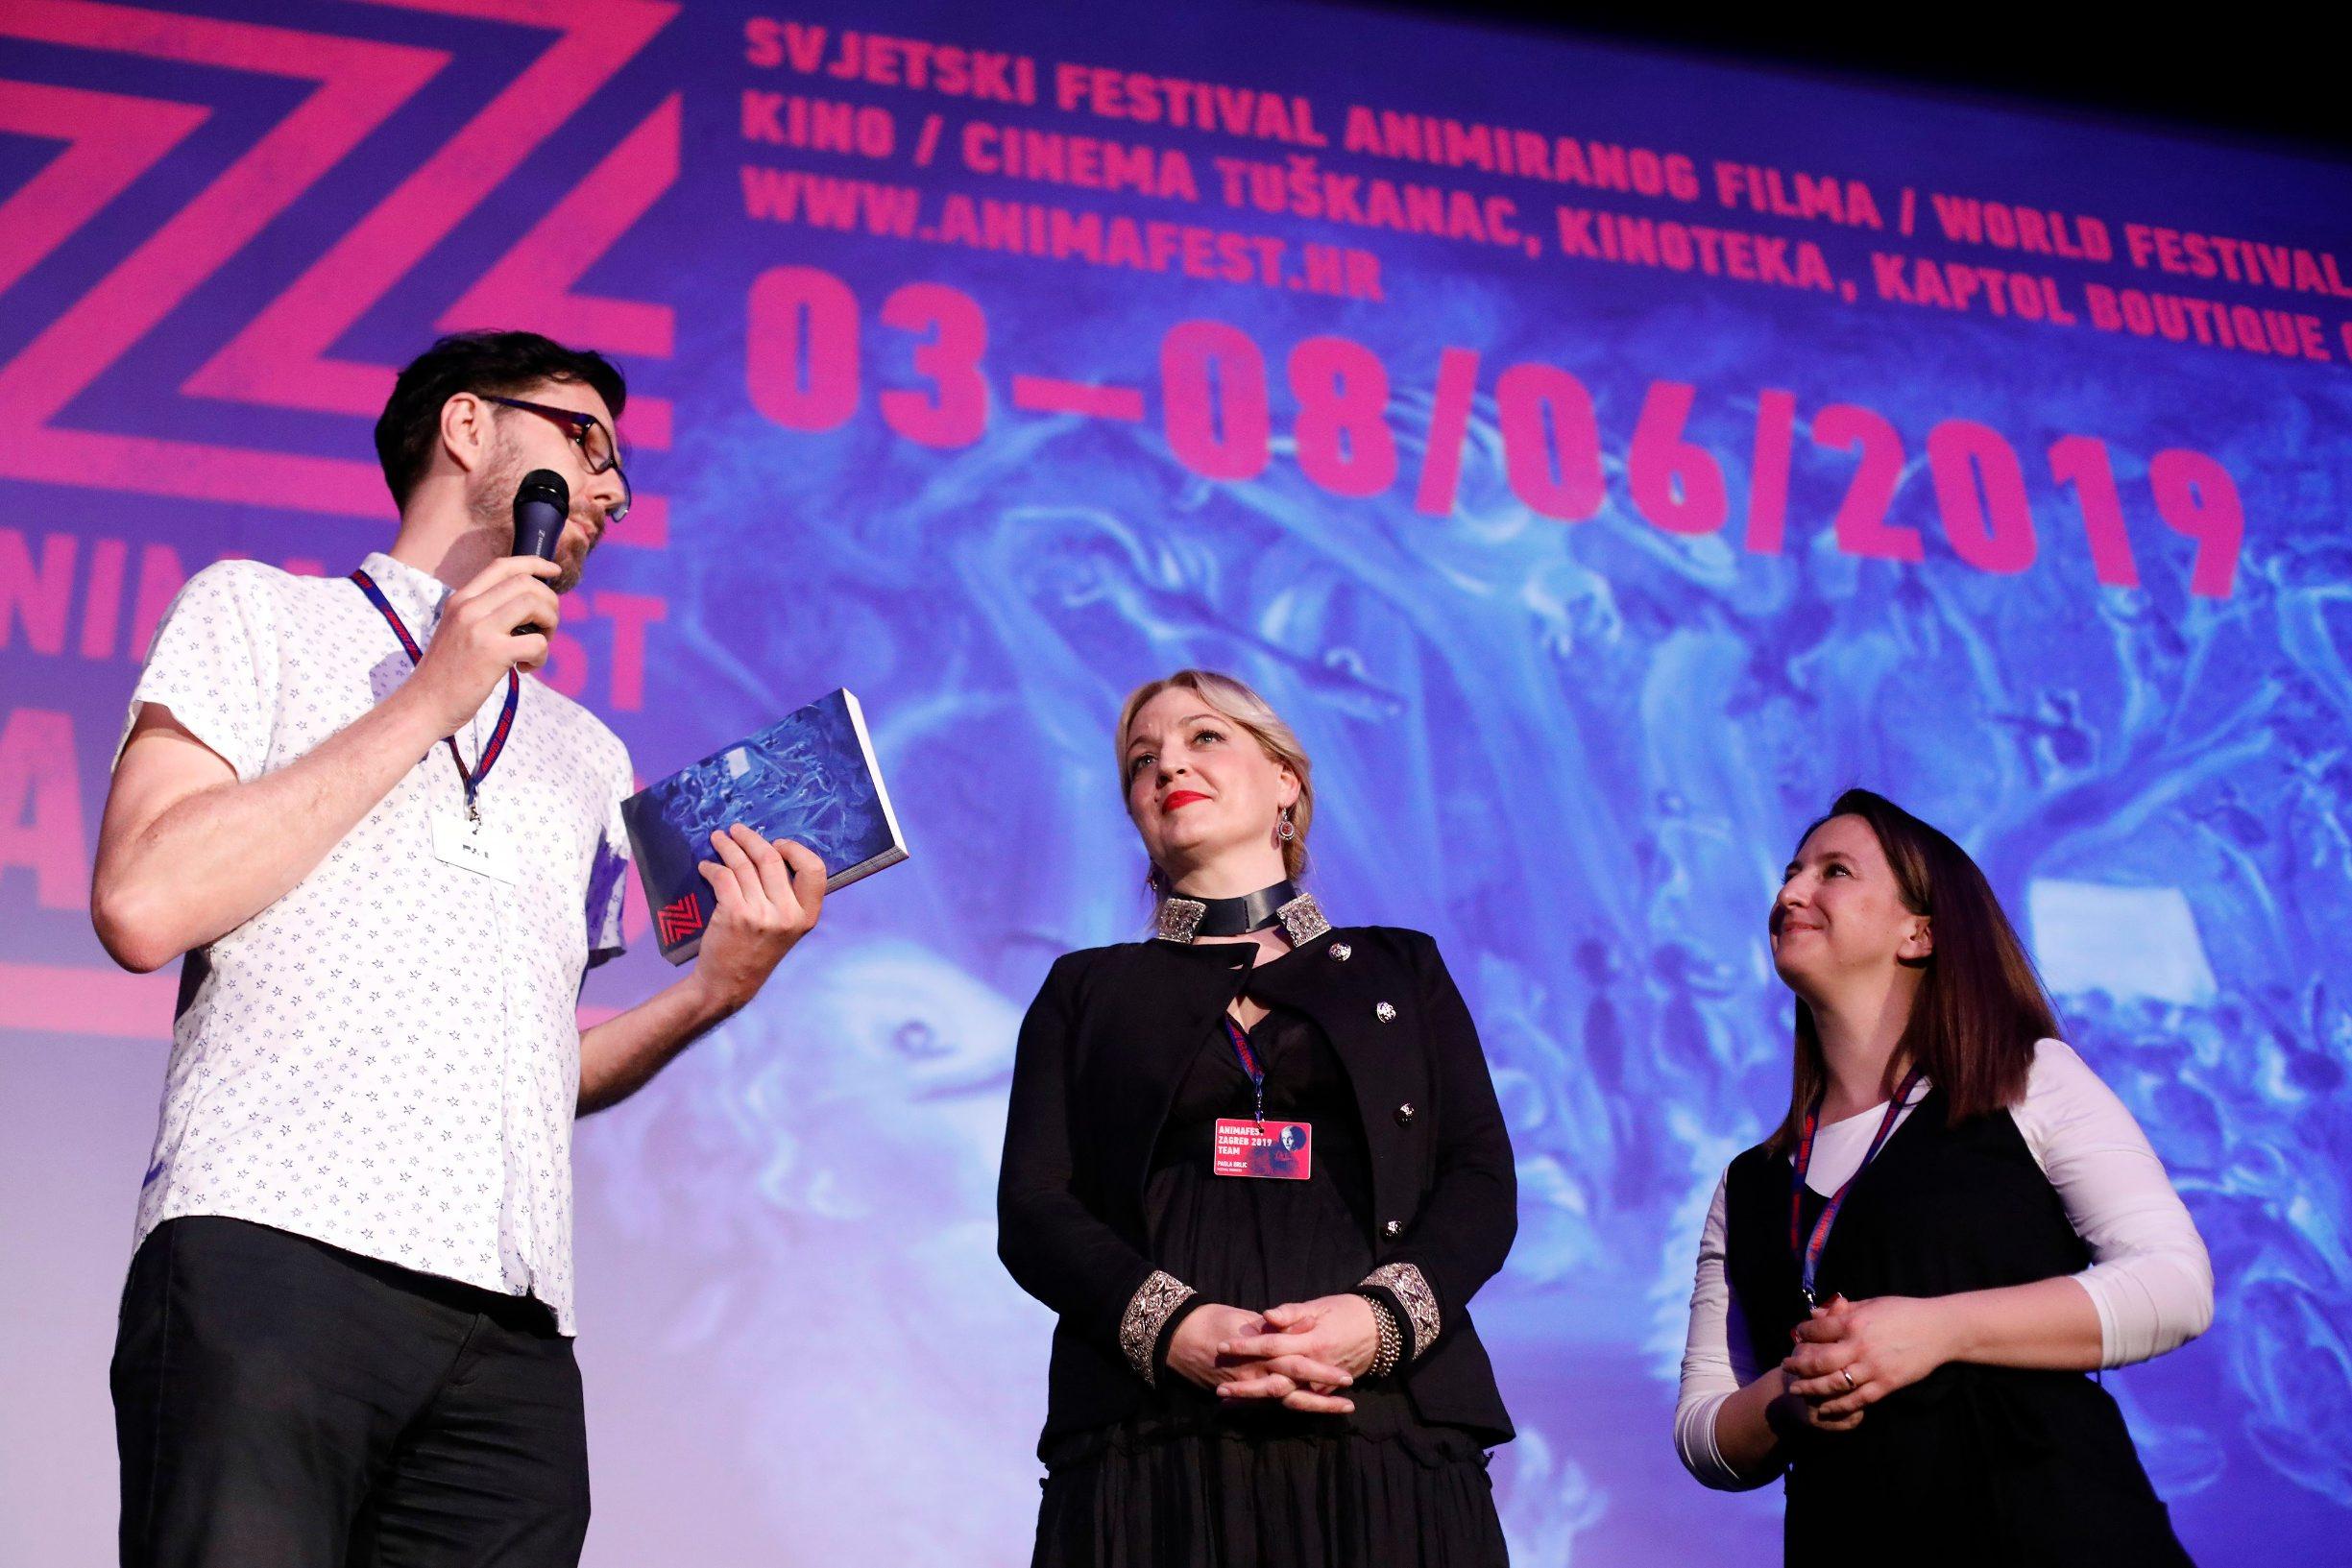 Zagreb, 030619. U kinu Tuskanac otvoren festival animiranog filma Animafest 2019. Na fotografiji: Daniel Suljic, Paola Orlic, Matea Milic. Foto: Tomislav Kristo / CROPIX